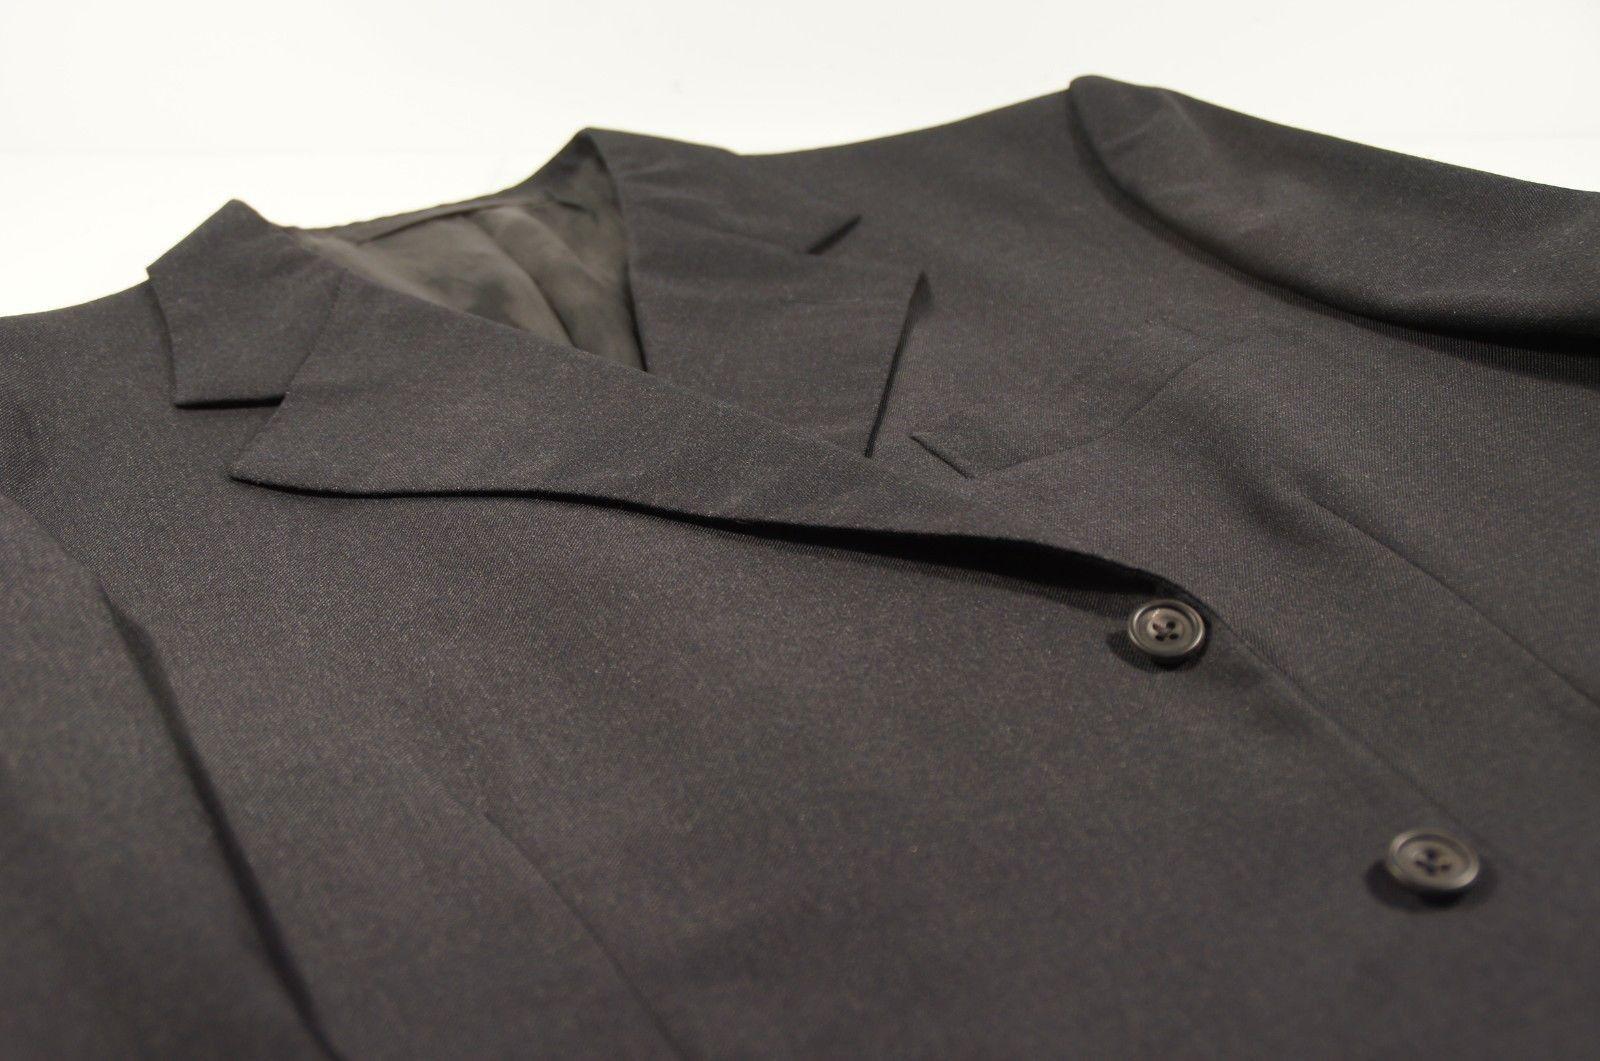 Savile Row Bespoke Dege & Sons Dark Charcoal grau Suit Coat EU 56 L / USA 46 L